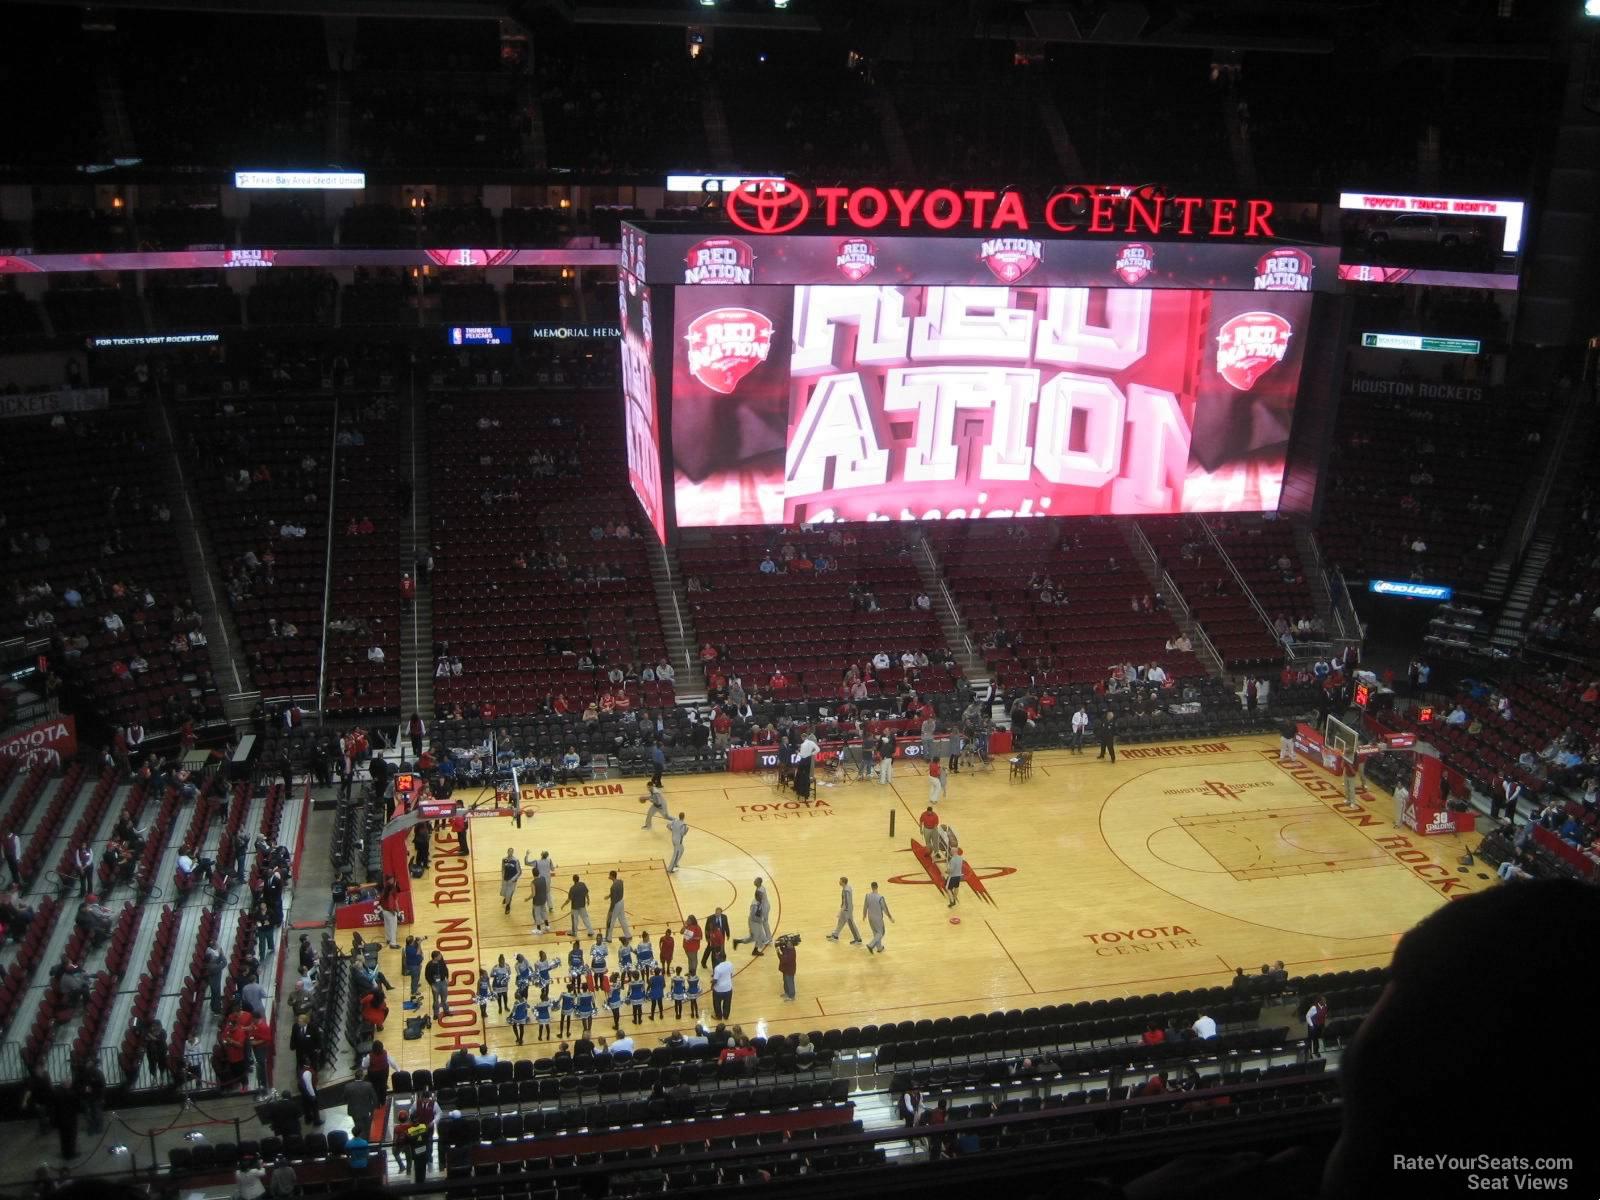 400 Level Center Toyota Center Basketball Seating